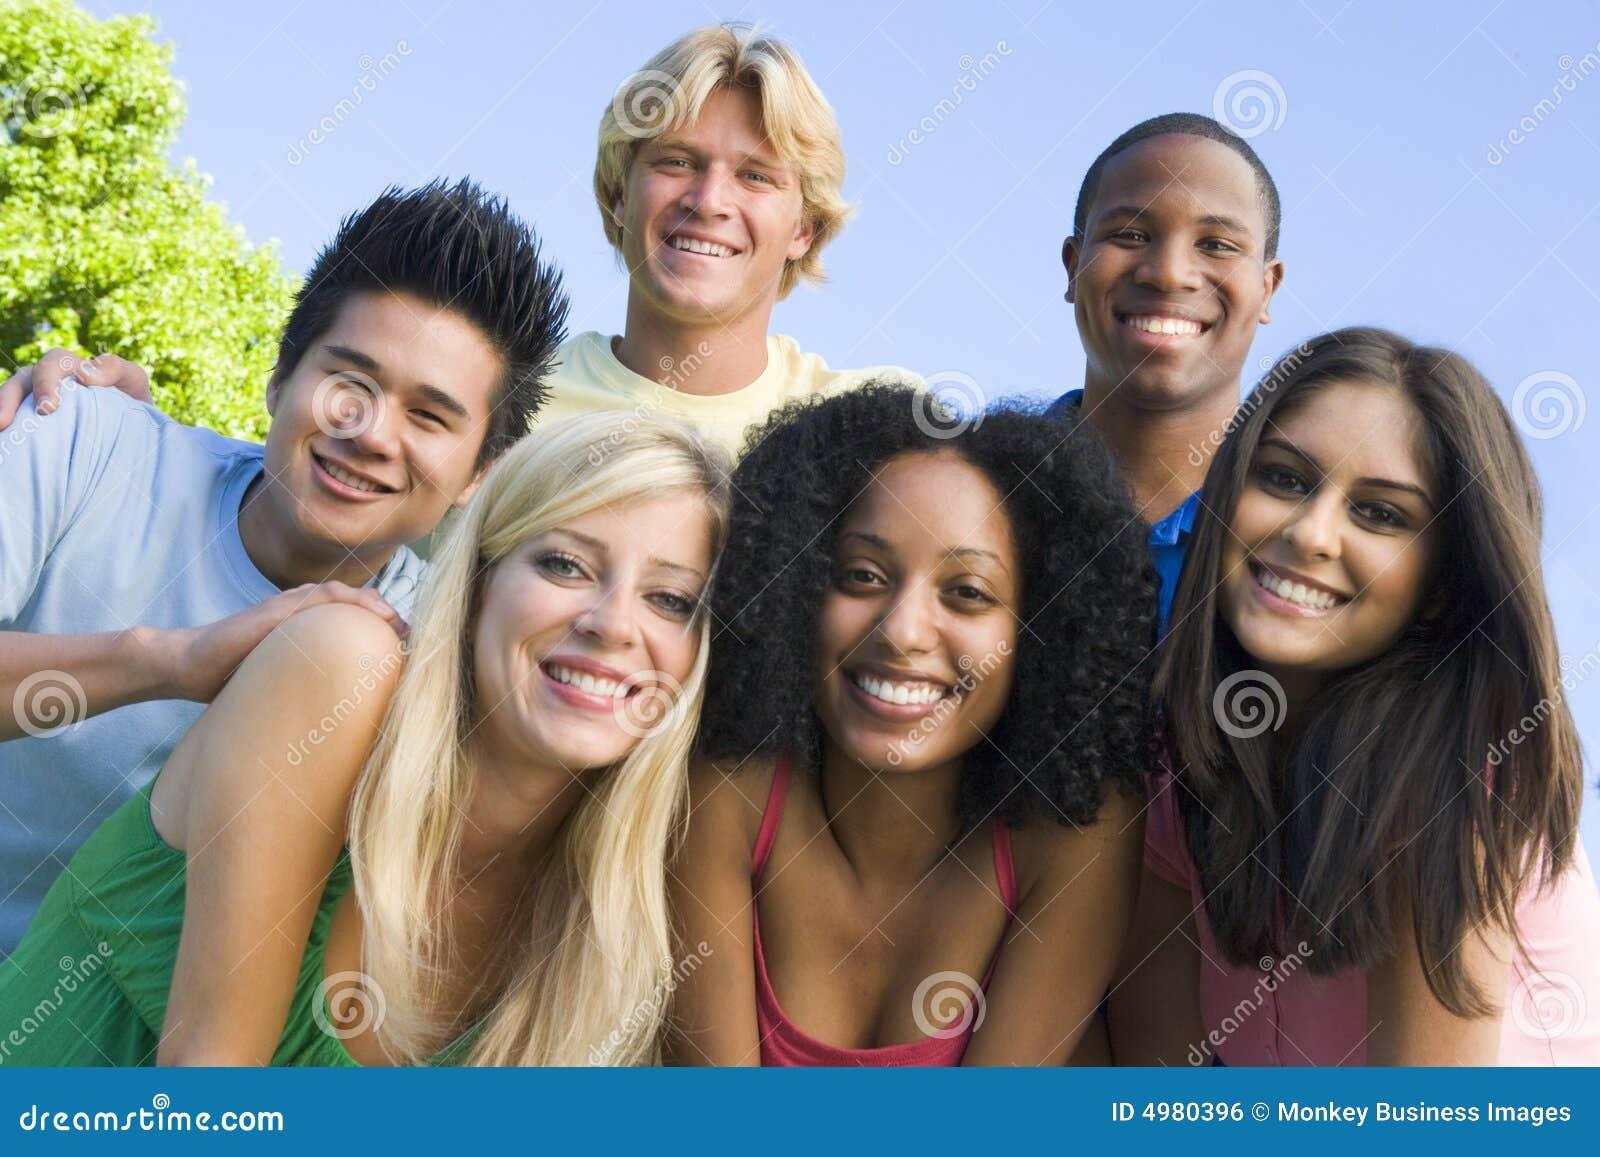 Teen Dating Violence Facts vs Myths Teen Talk